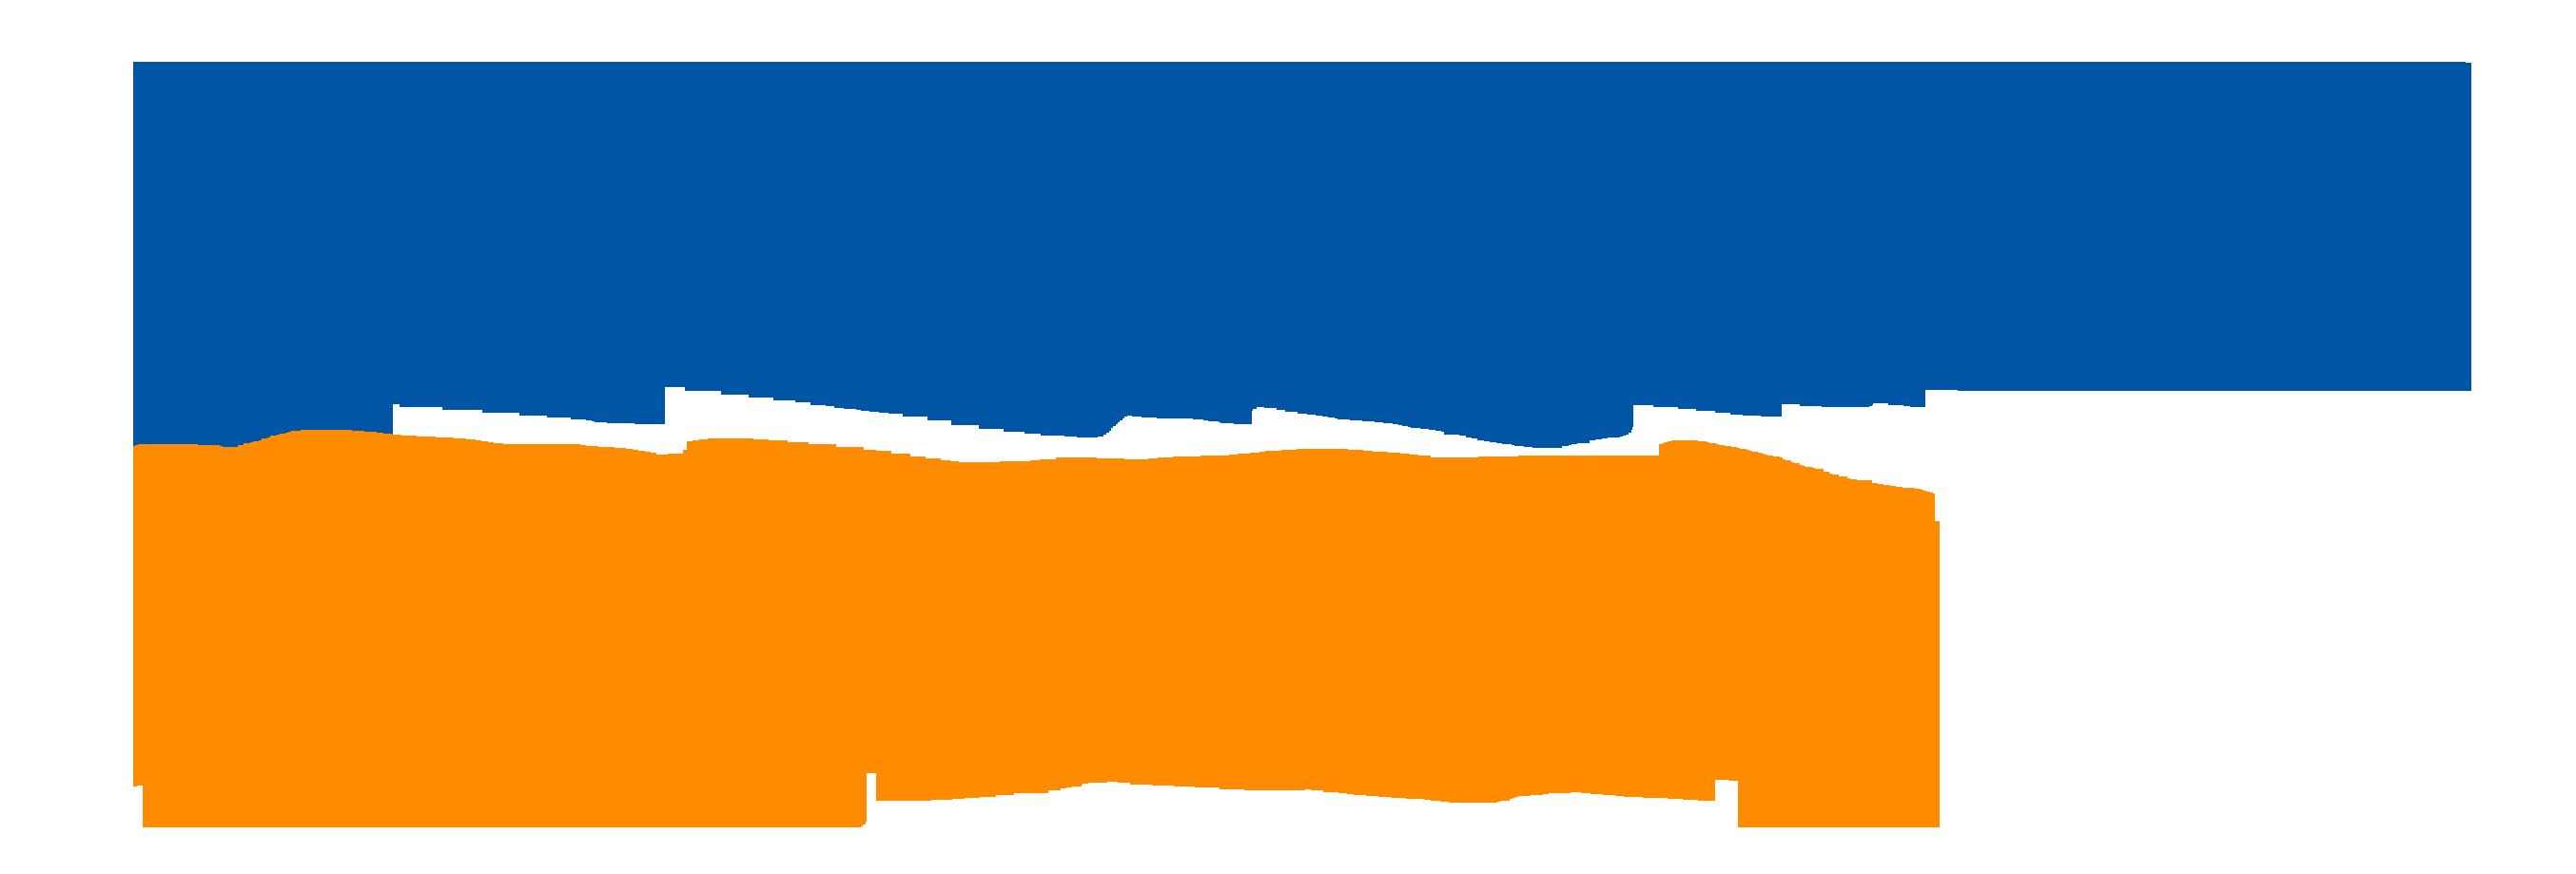 roofclad logo